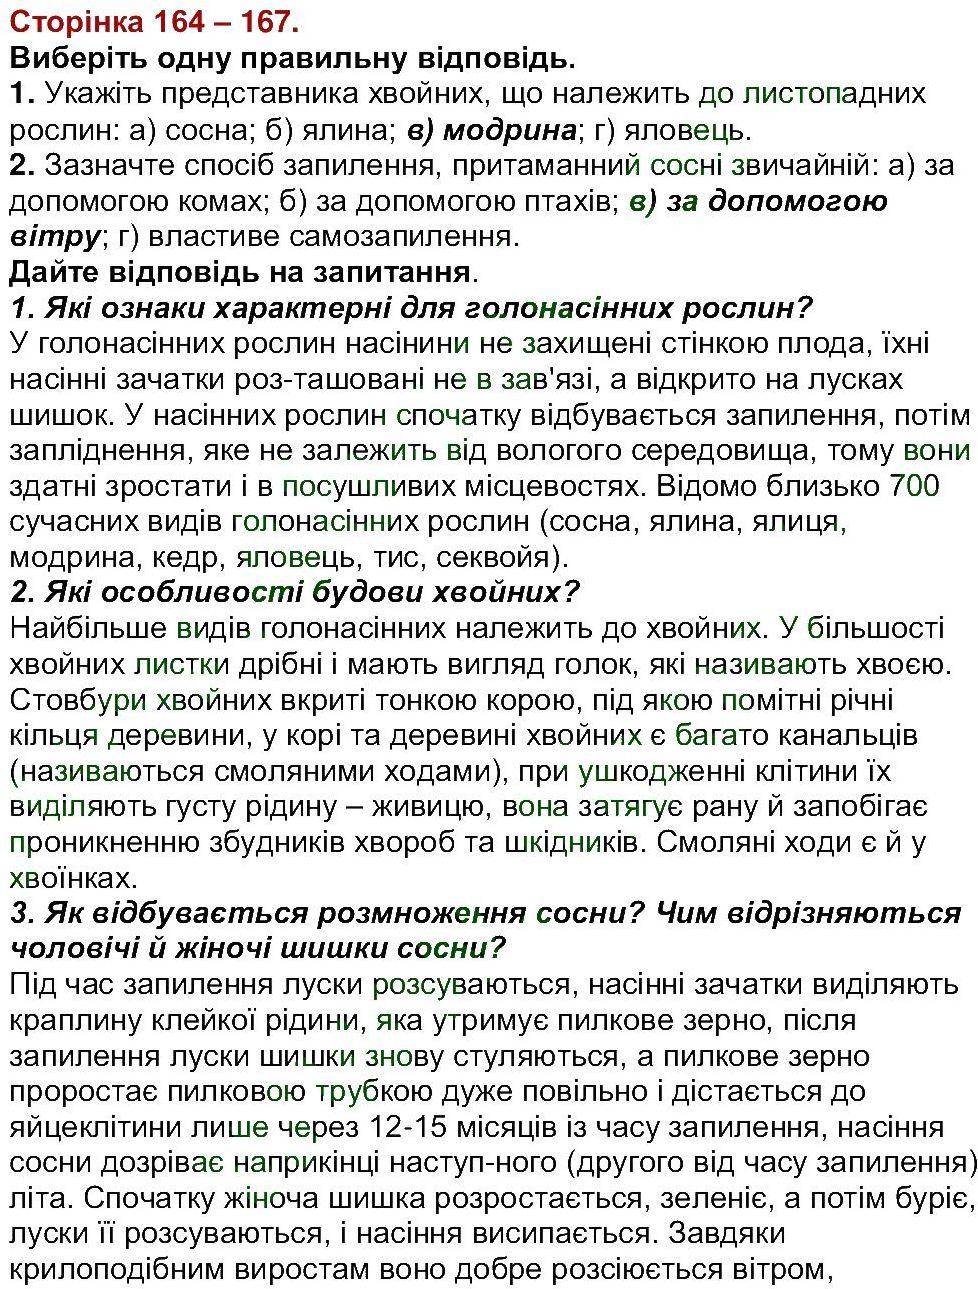 6-biologiya-li-ostapchenko-pg-balan-nyu-matyash-2016--tema-4-riznomanitnist-roslin-ст164-167.jpg